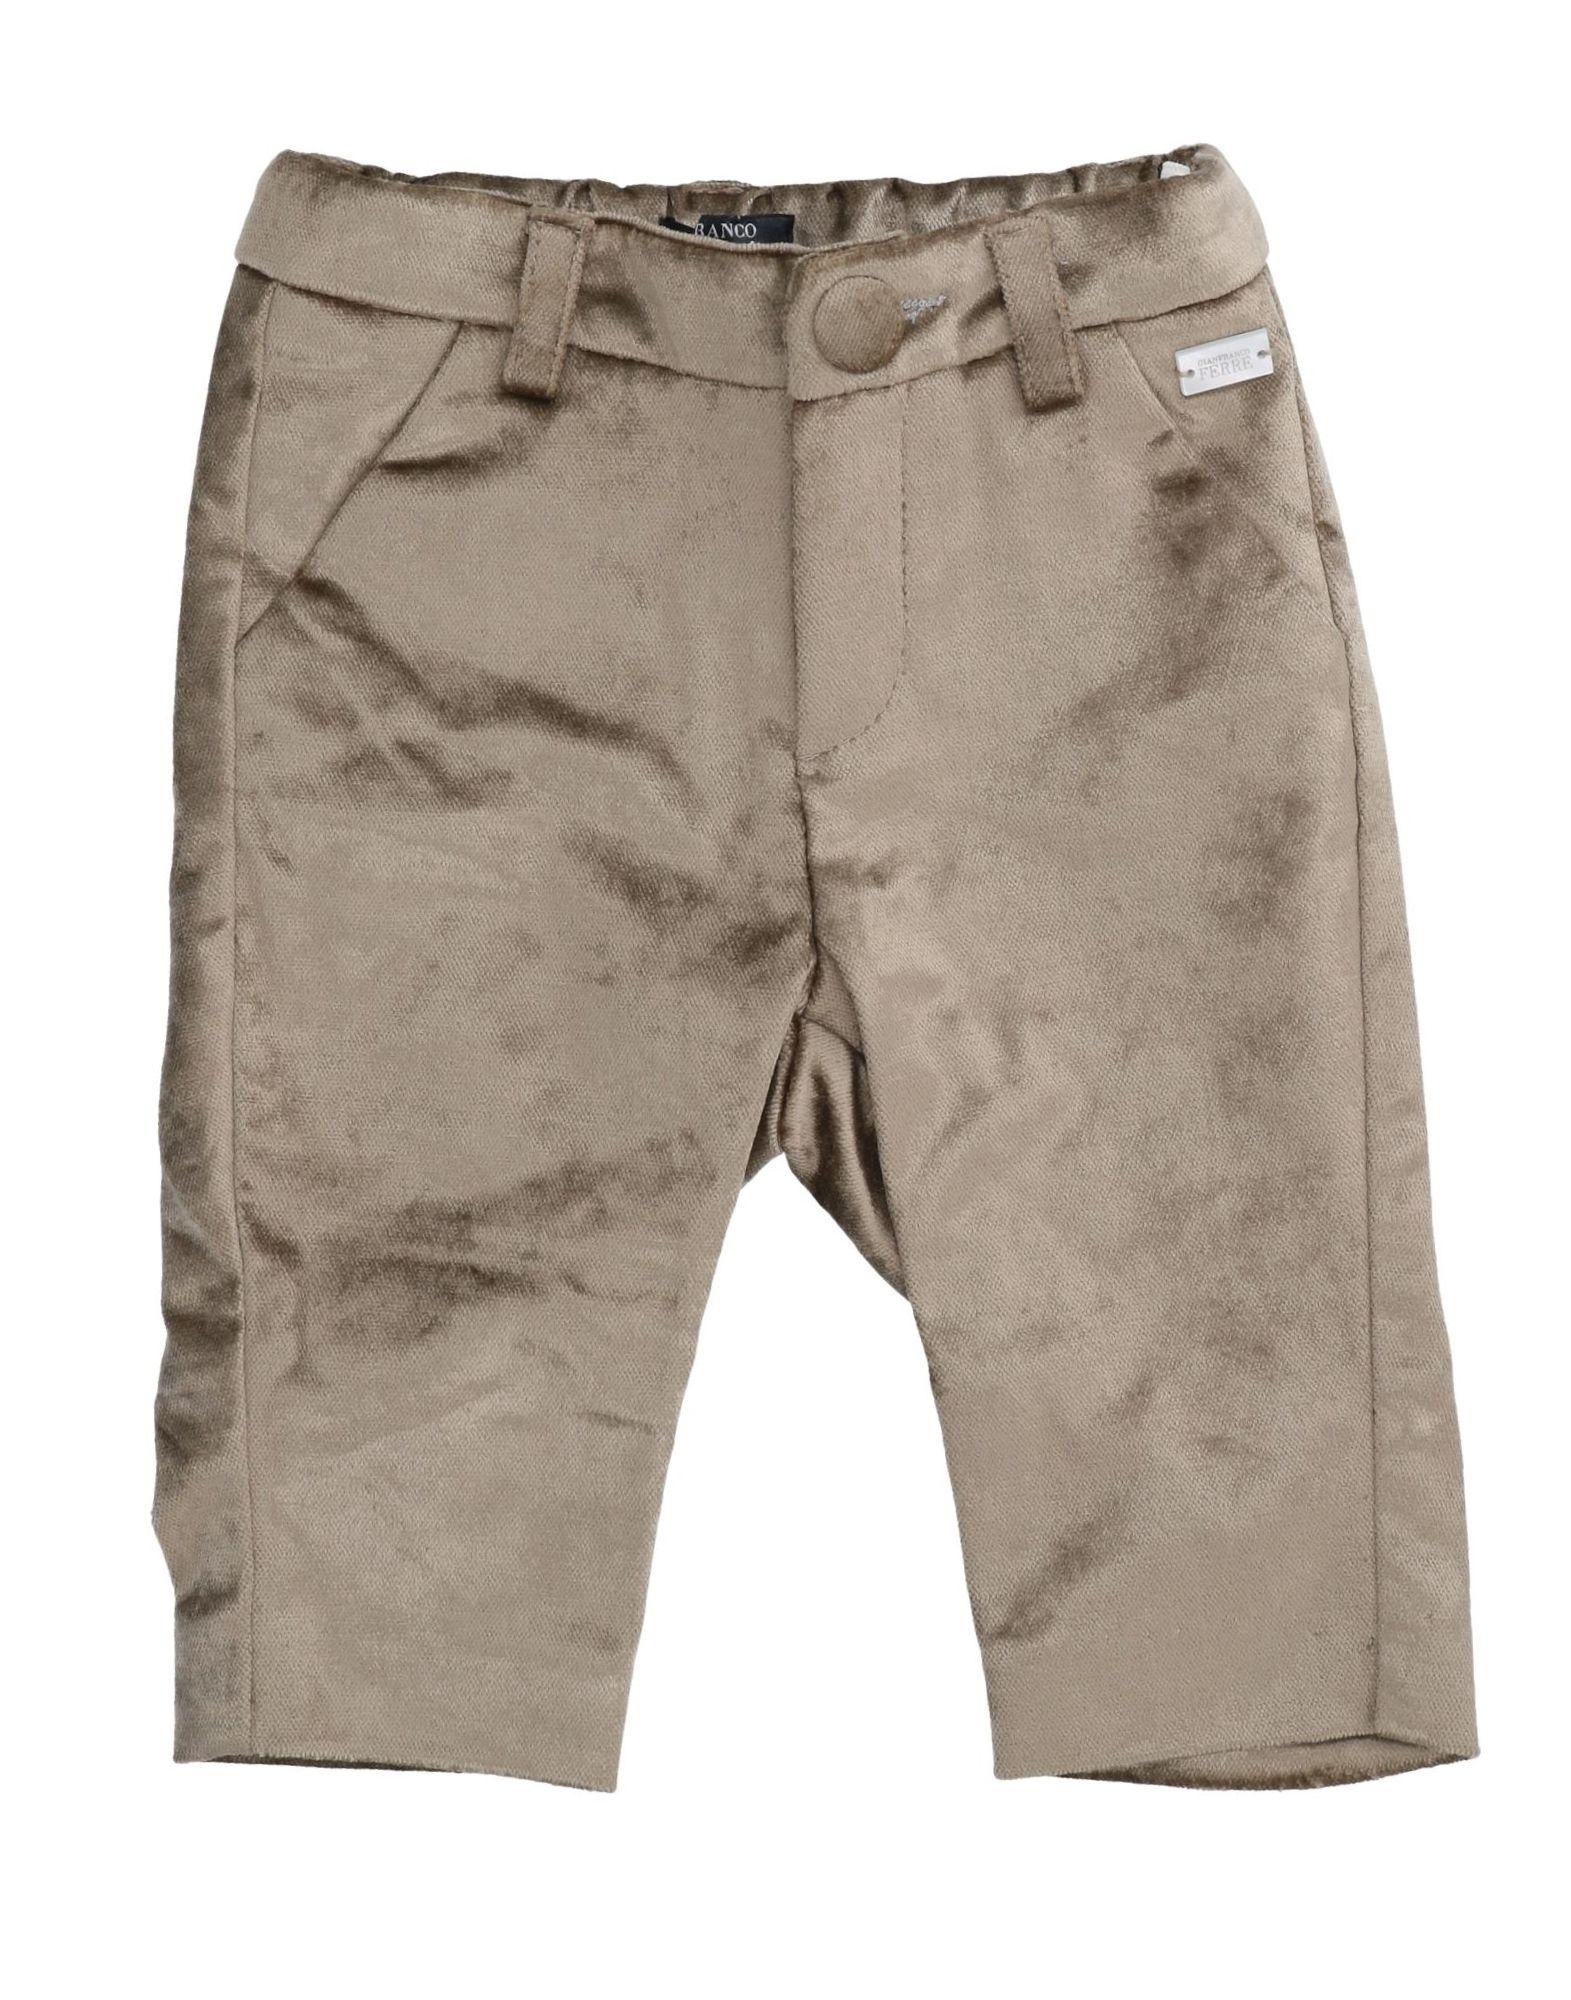 Gianfranco Ferre Kids' Casual Pants In Brown